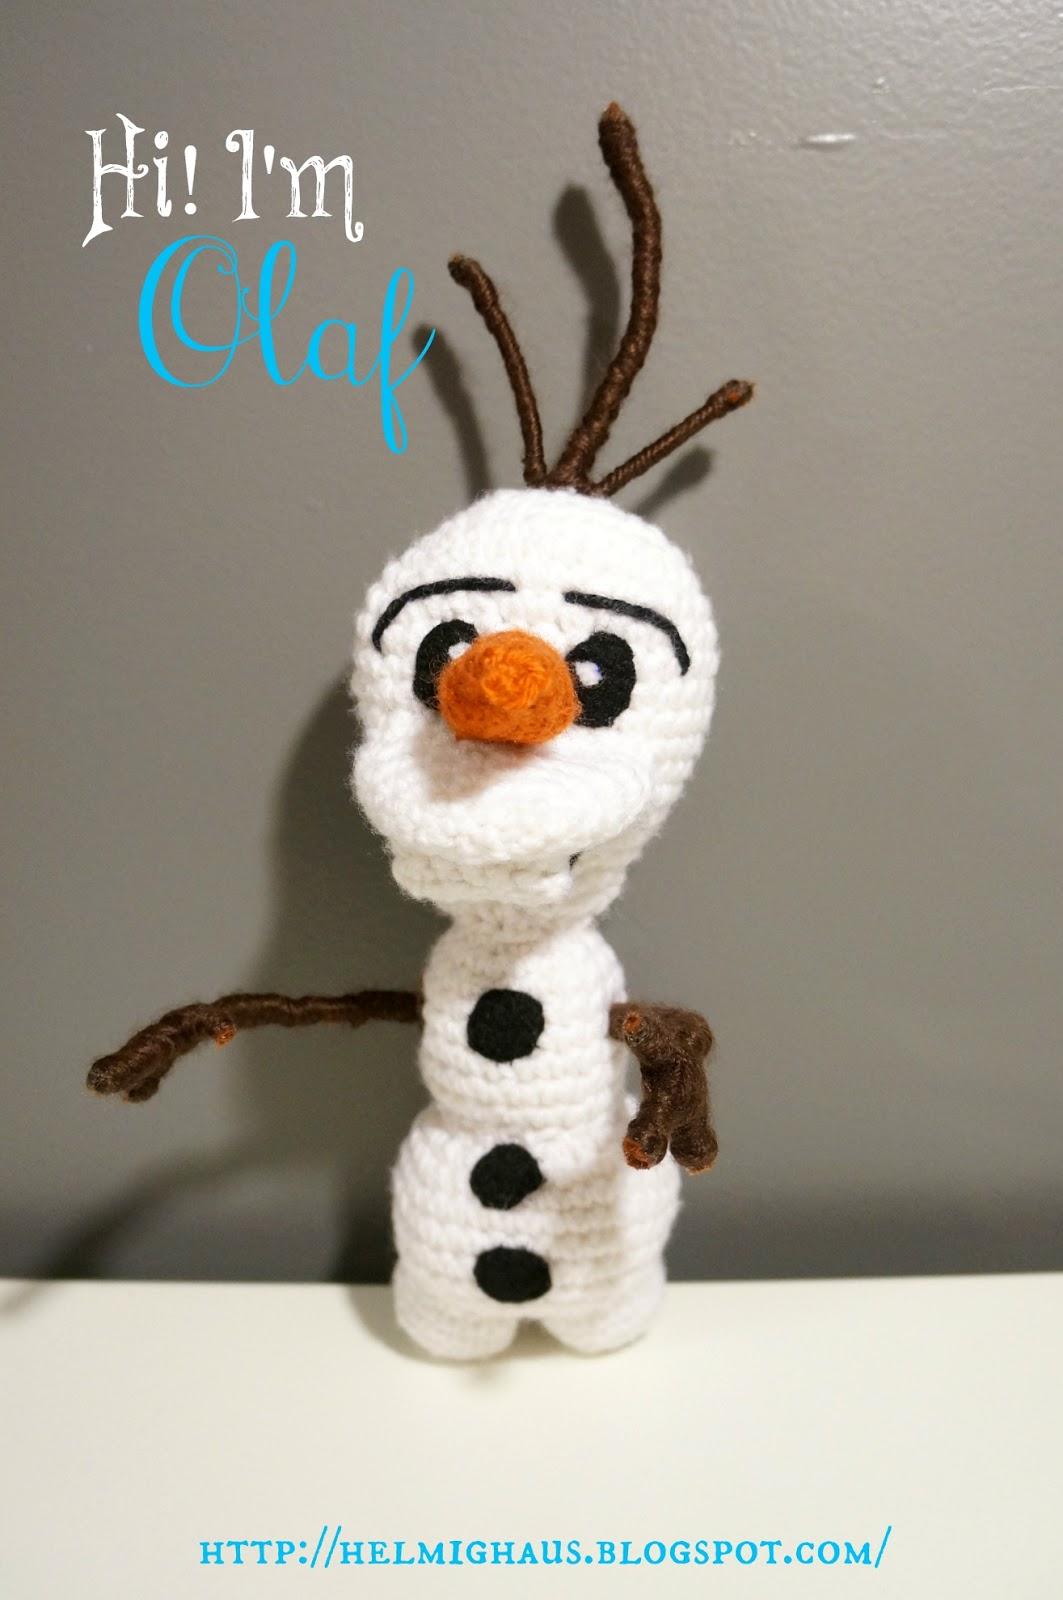 Crochet Doll Cradle Purse Pattern : HelmigHaus: Disneys Frozen Inspired Olaf Amigurumi Doll